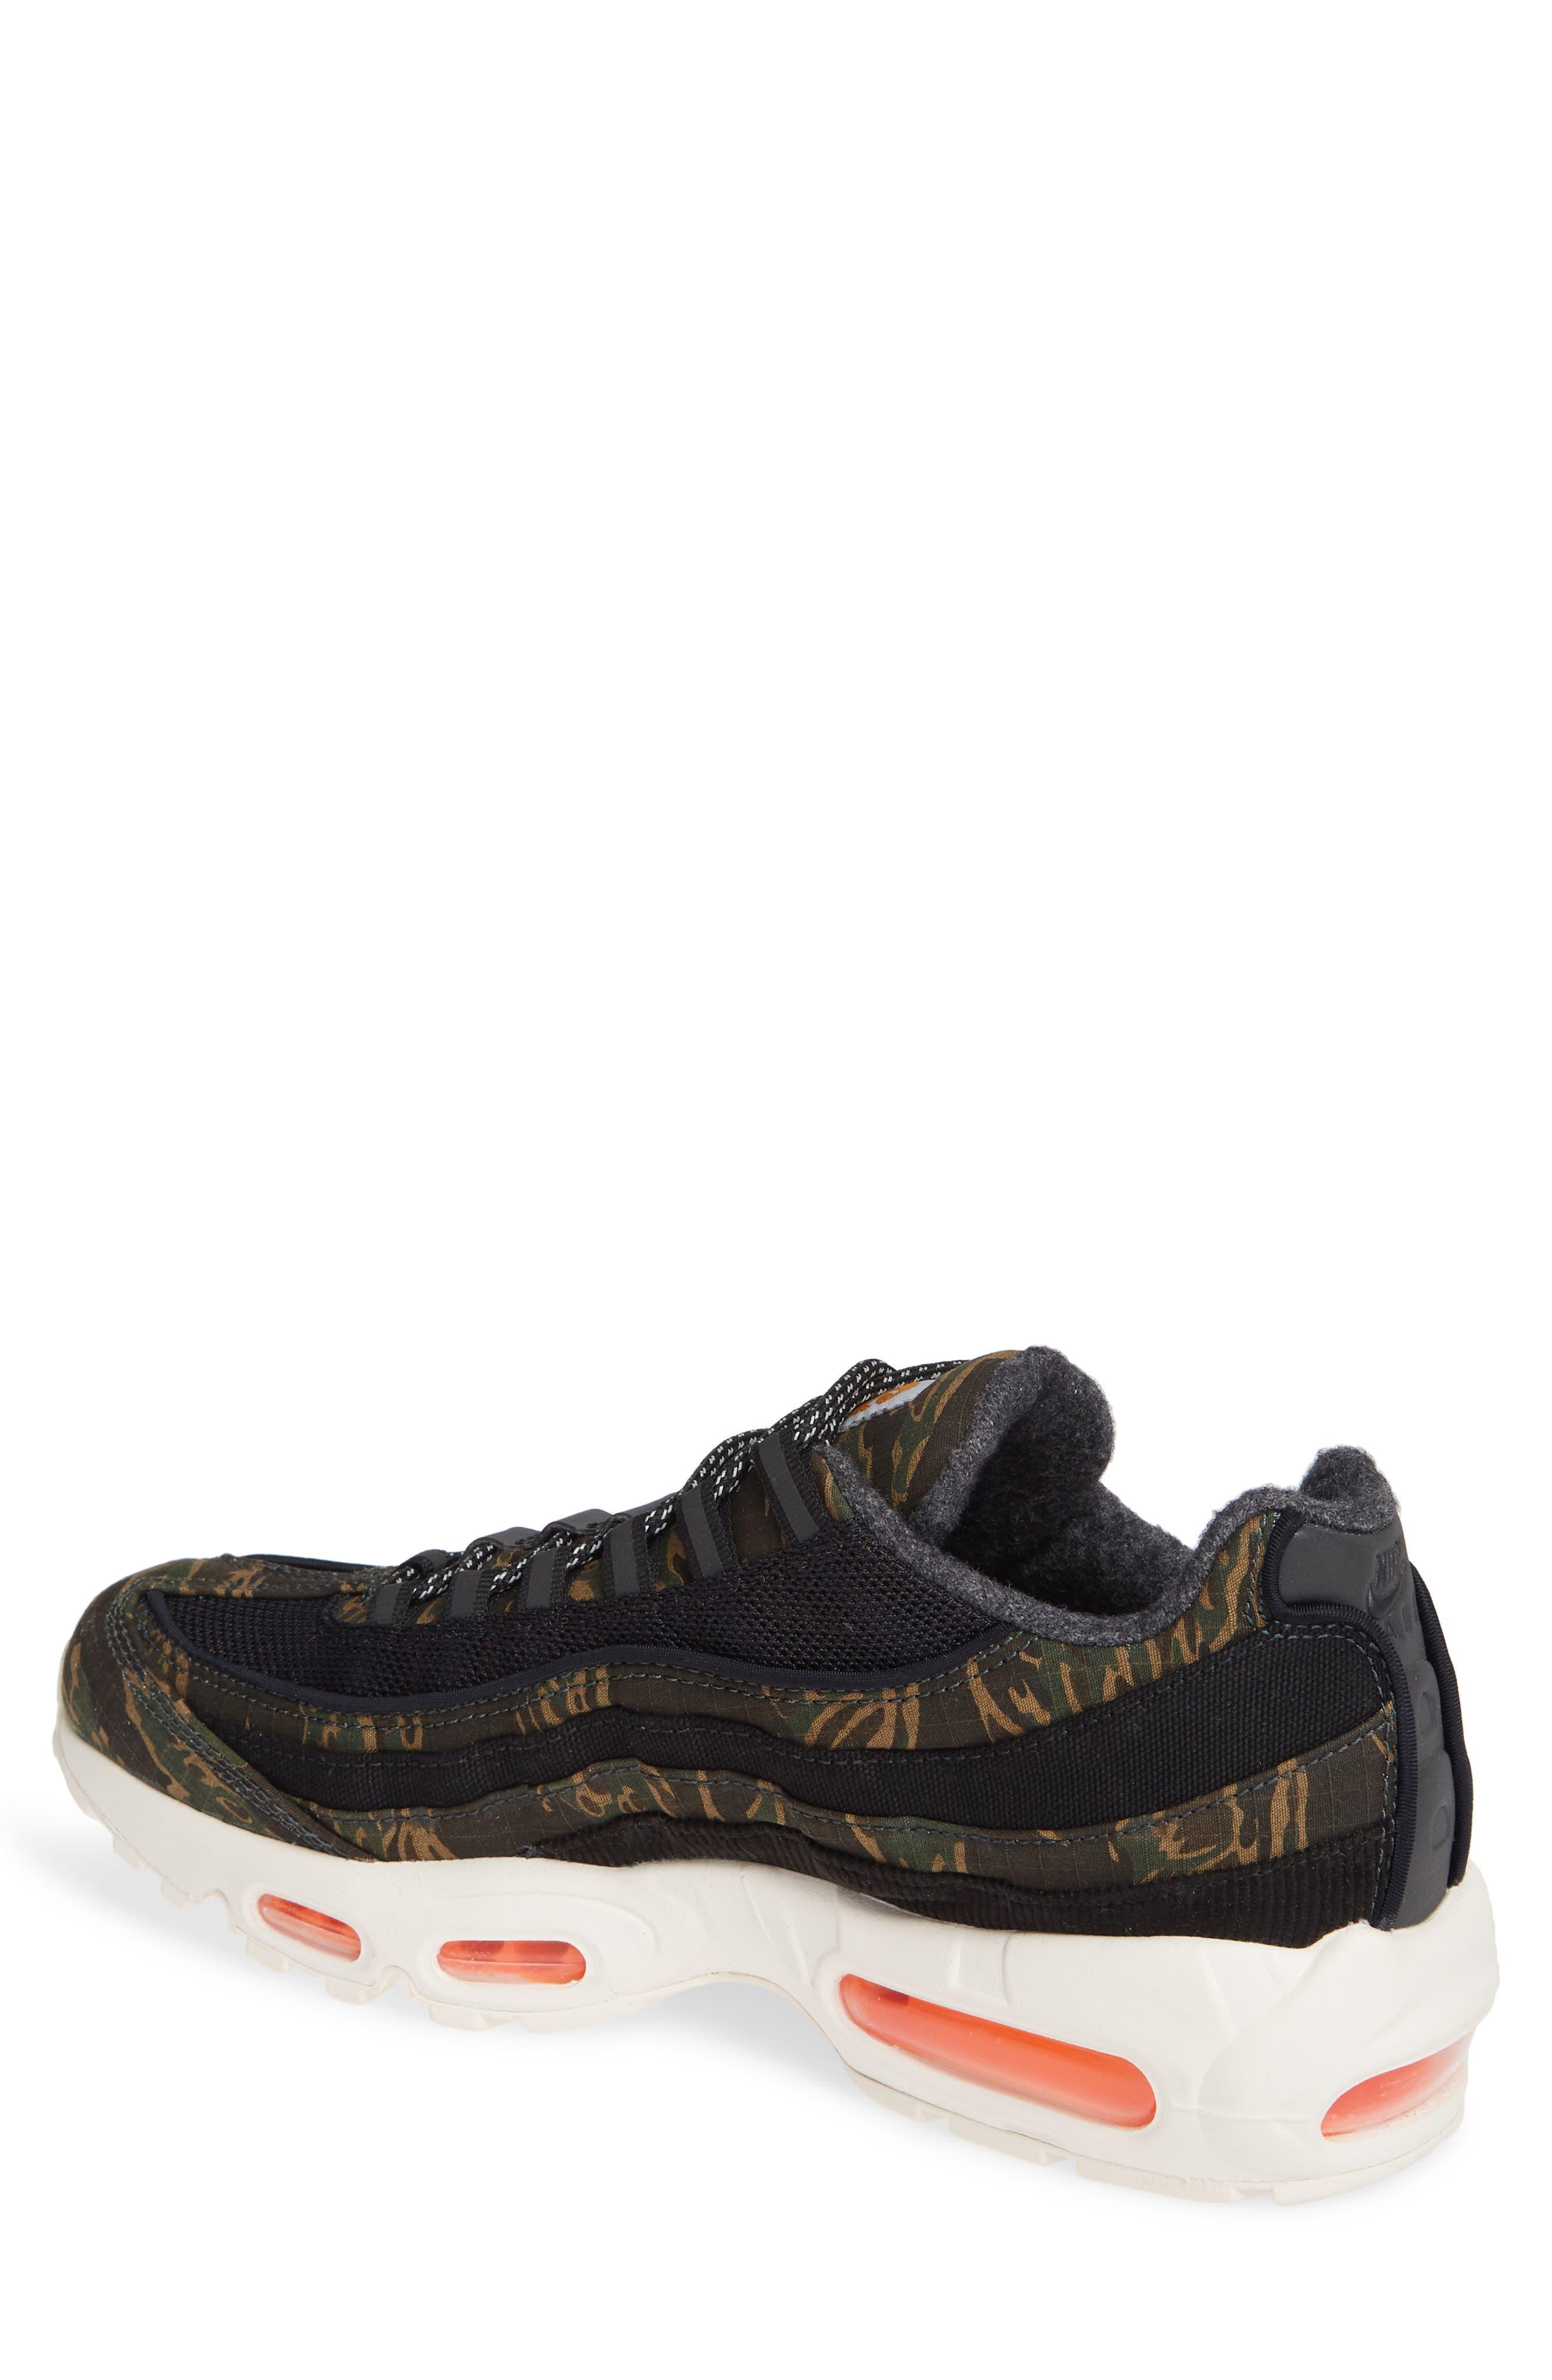 NIKE,                             x Carhartt Air Max 95 WIP Sneaker,                             Alternate thumbnail 2, color,                             001